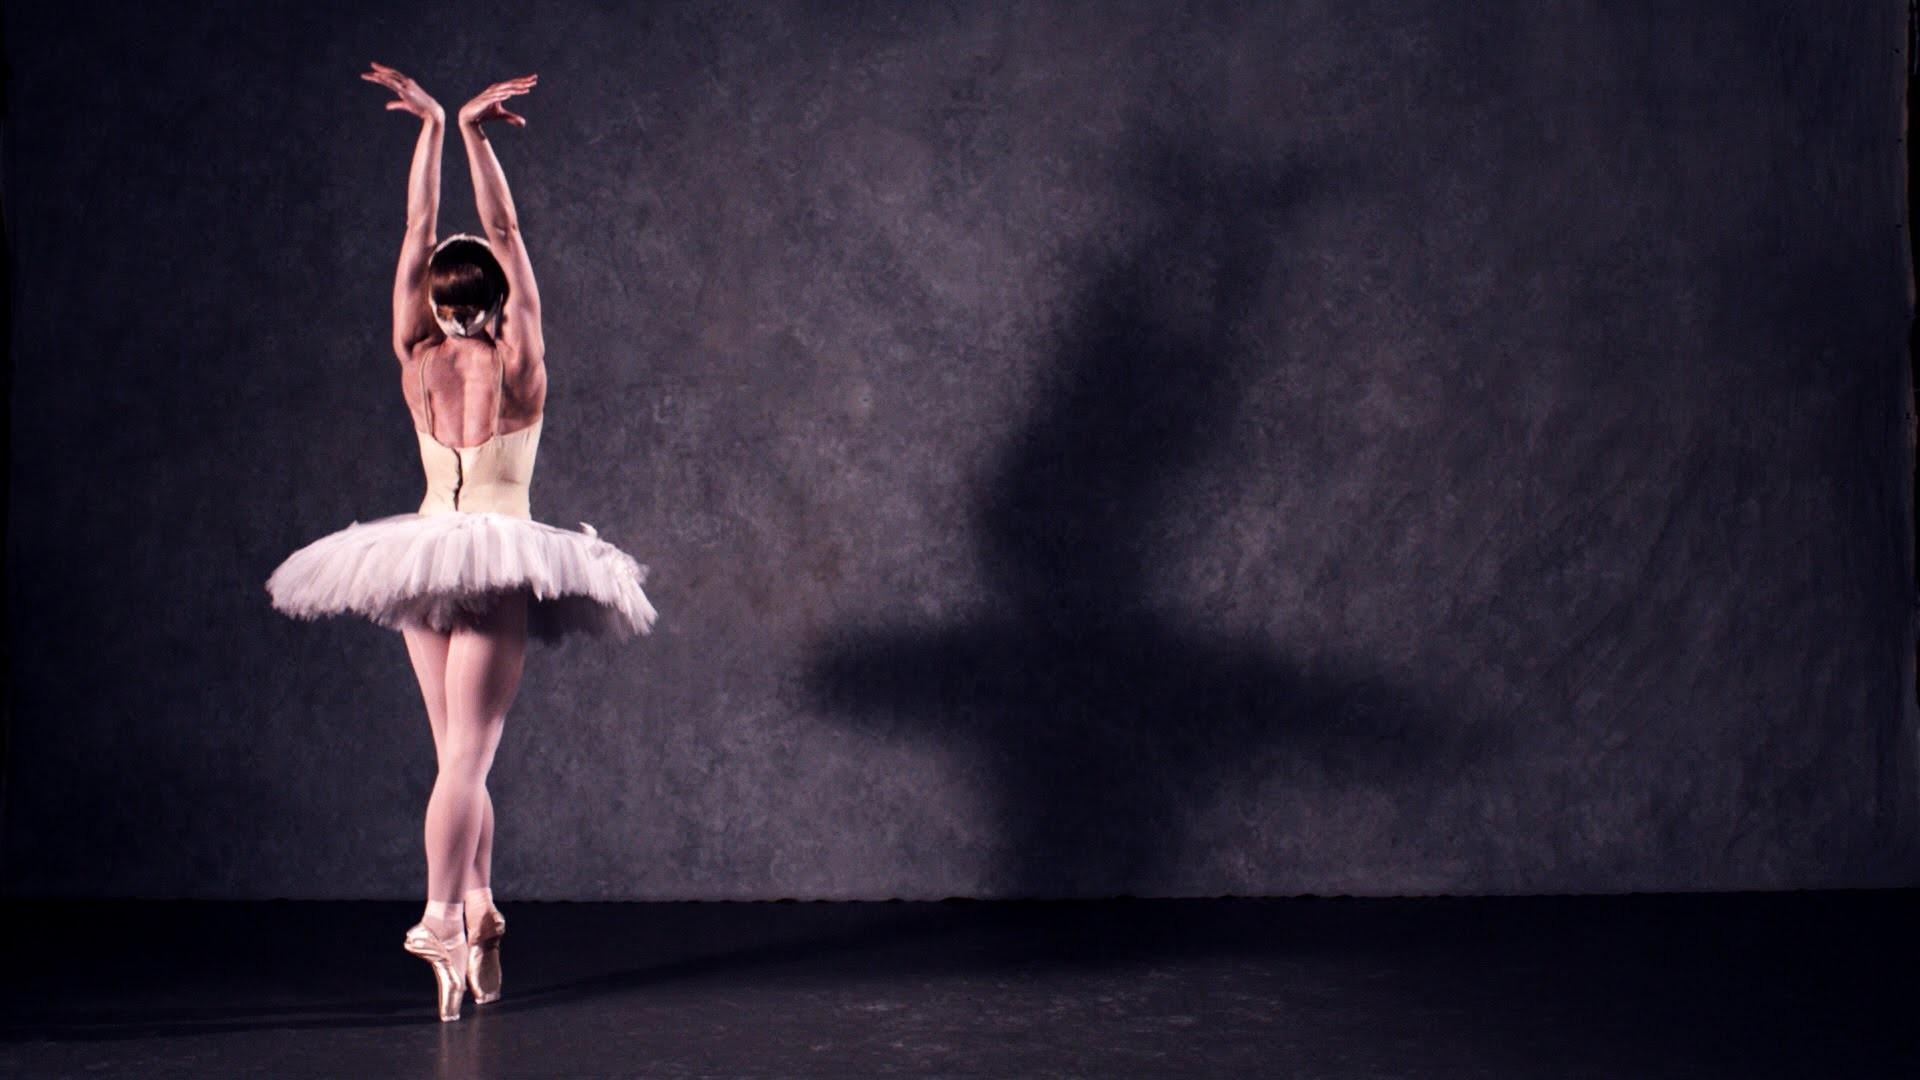 Ballet Dance Wallpapers Hd Dodskypict: Dancers Wallpapers (69+ Images